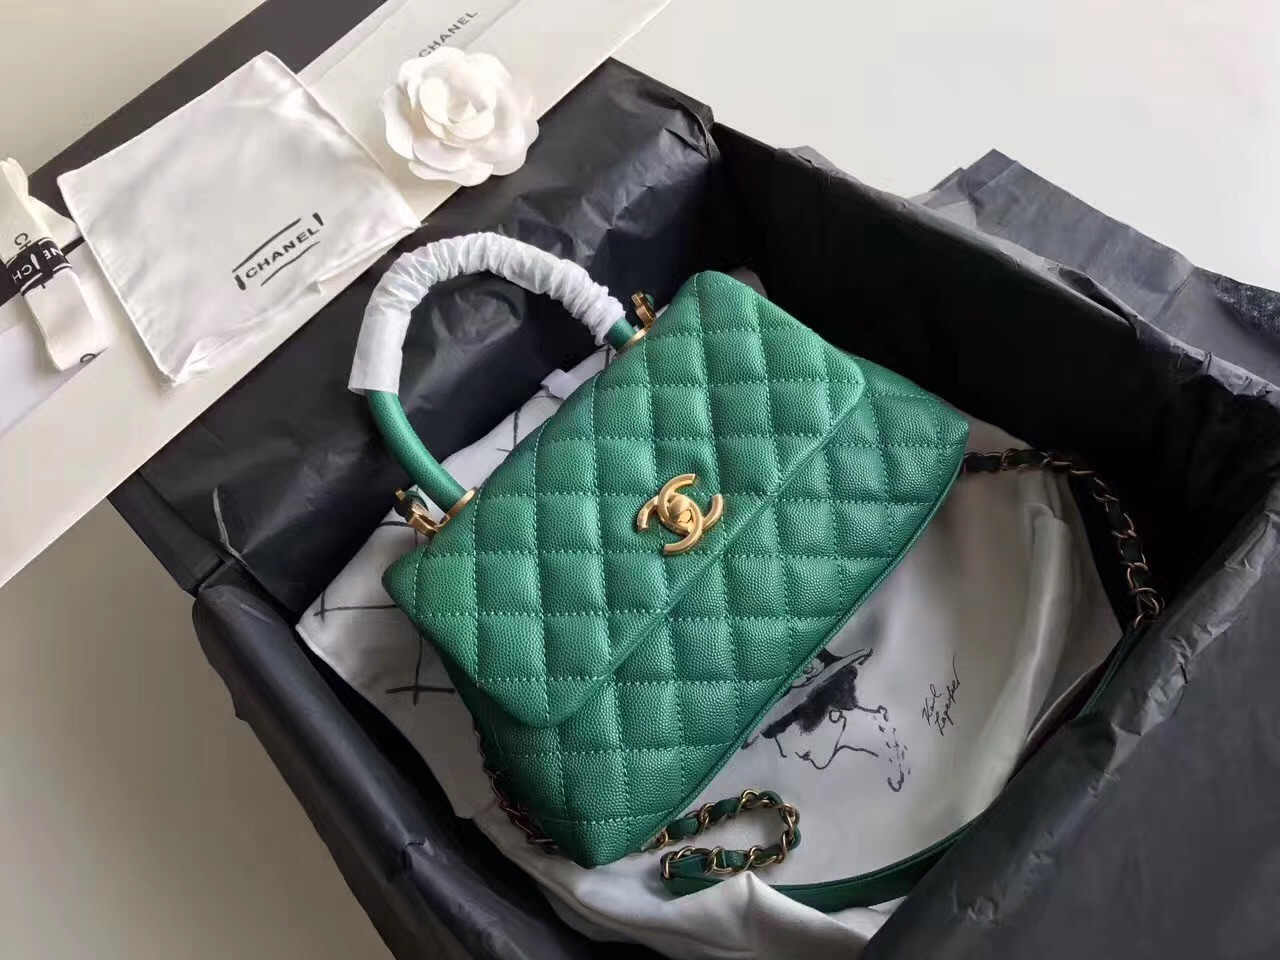 cadbe1fda6c5 Chanel Green Flap Bag with top handle A92991 - Bella Vita Moda